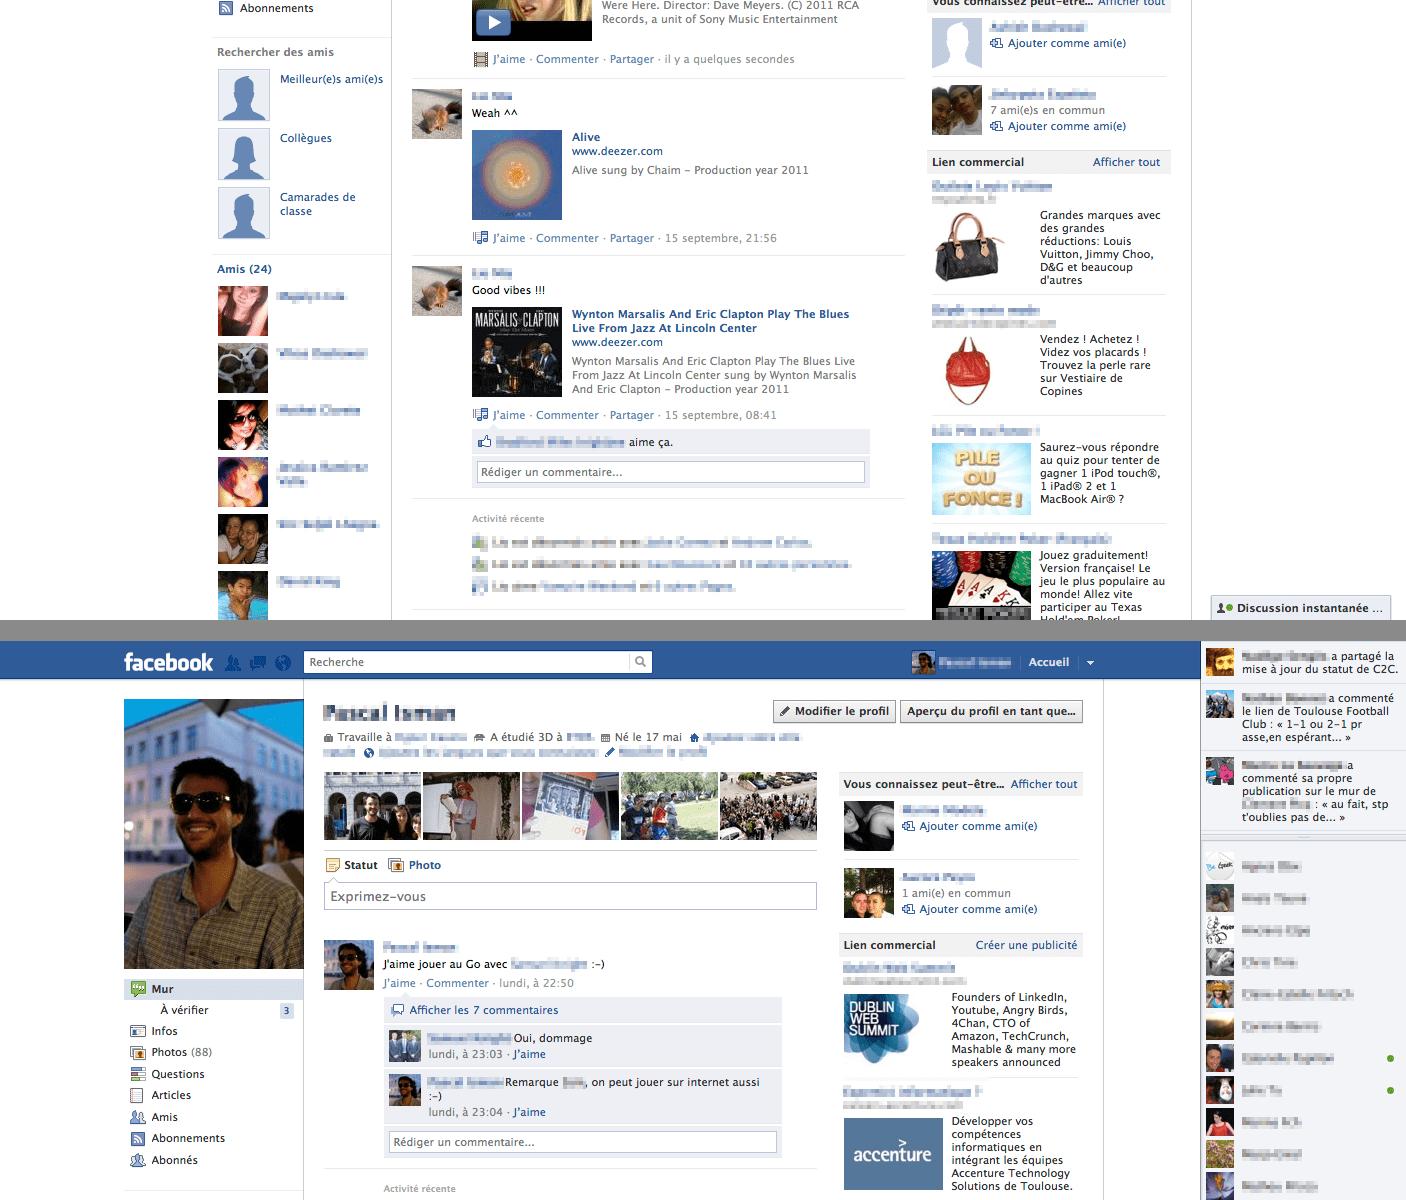 Comparatif entre deux version de facebook